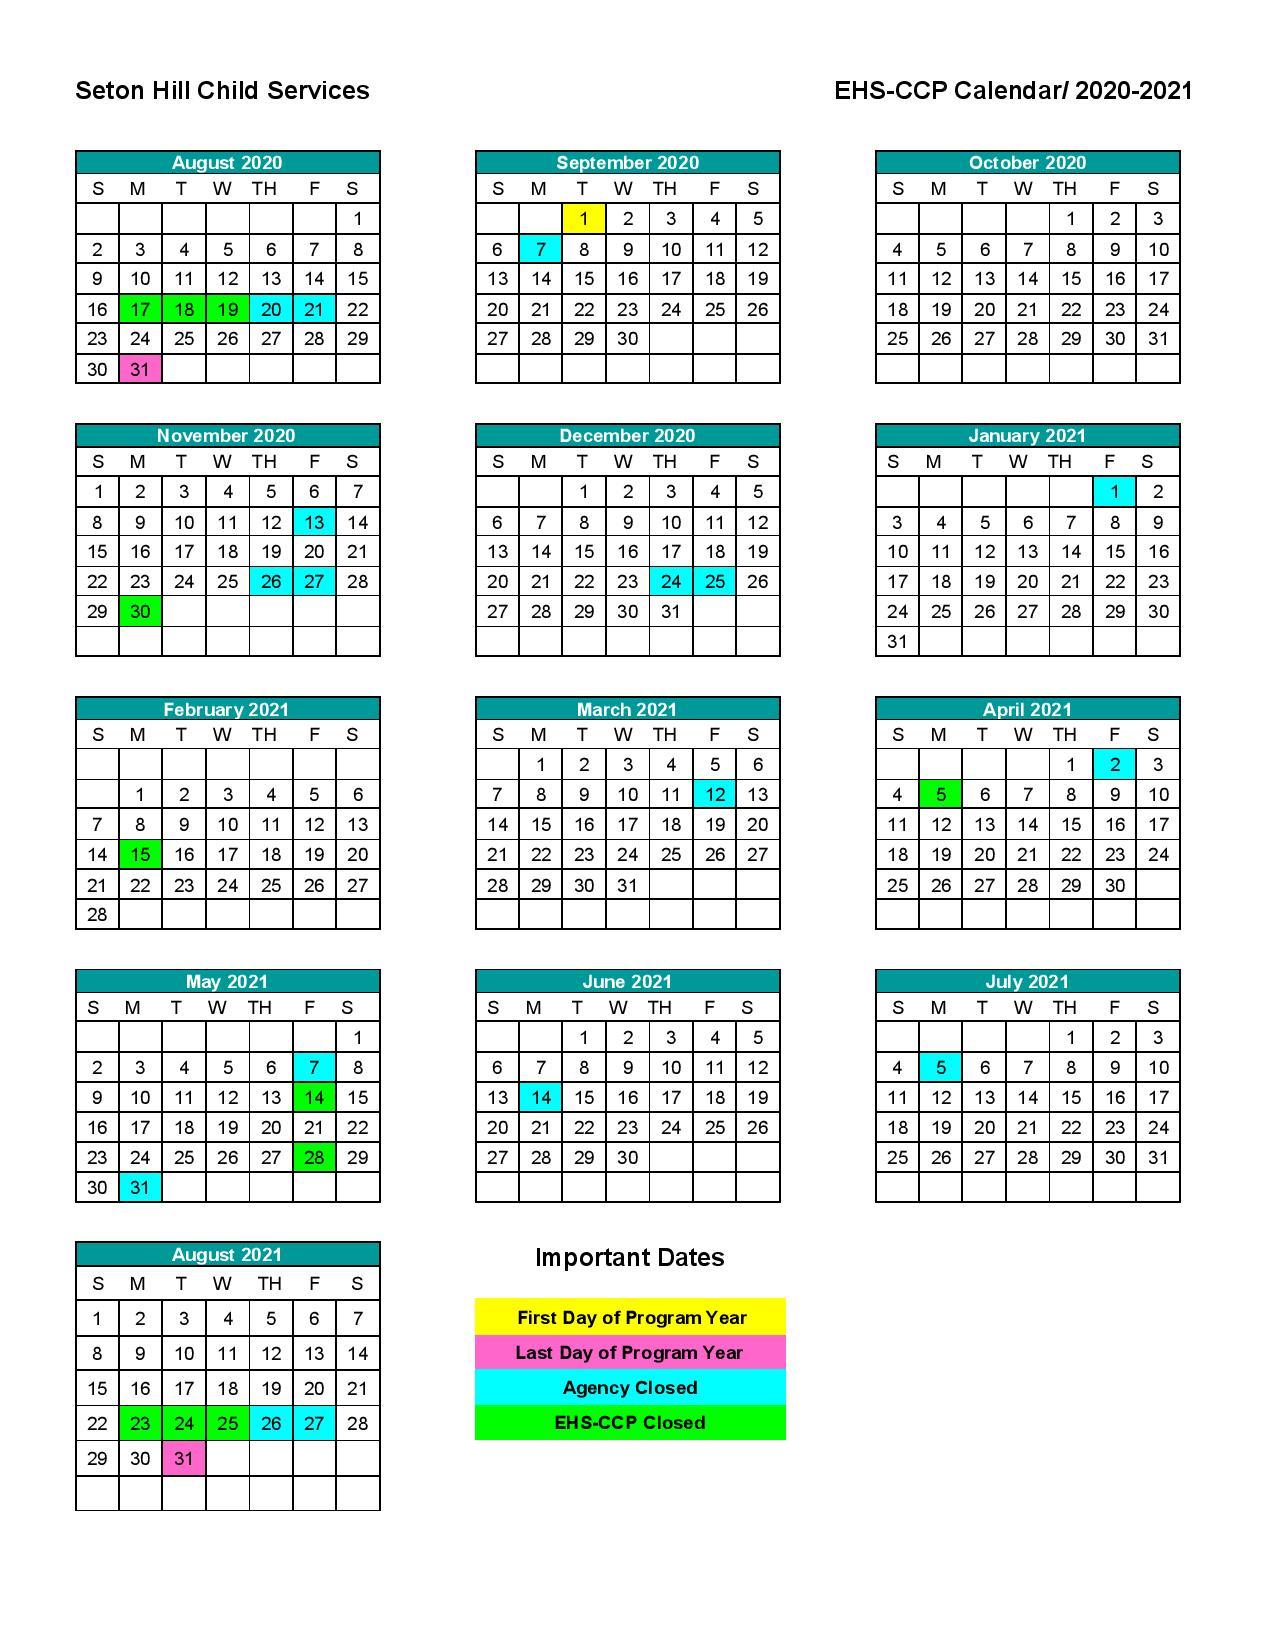 Parent Calendars - Seton Hill Child Services inside 454 Retail Calendar